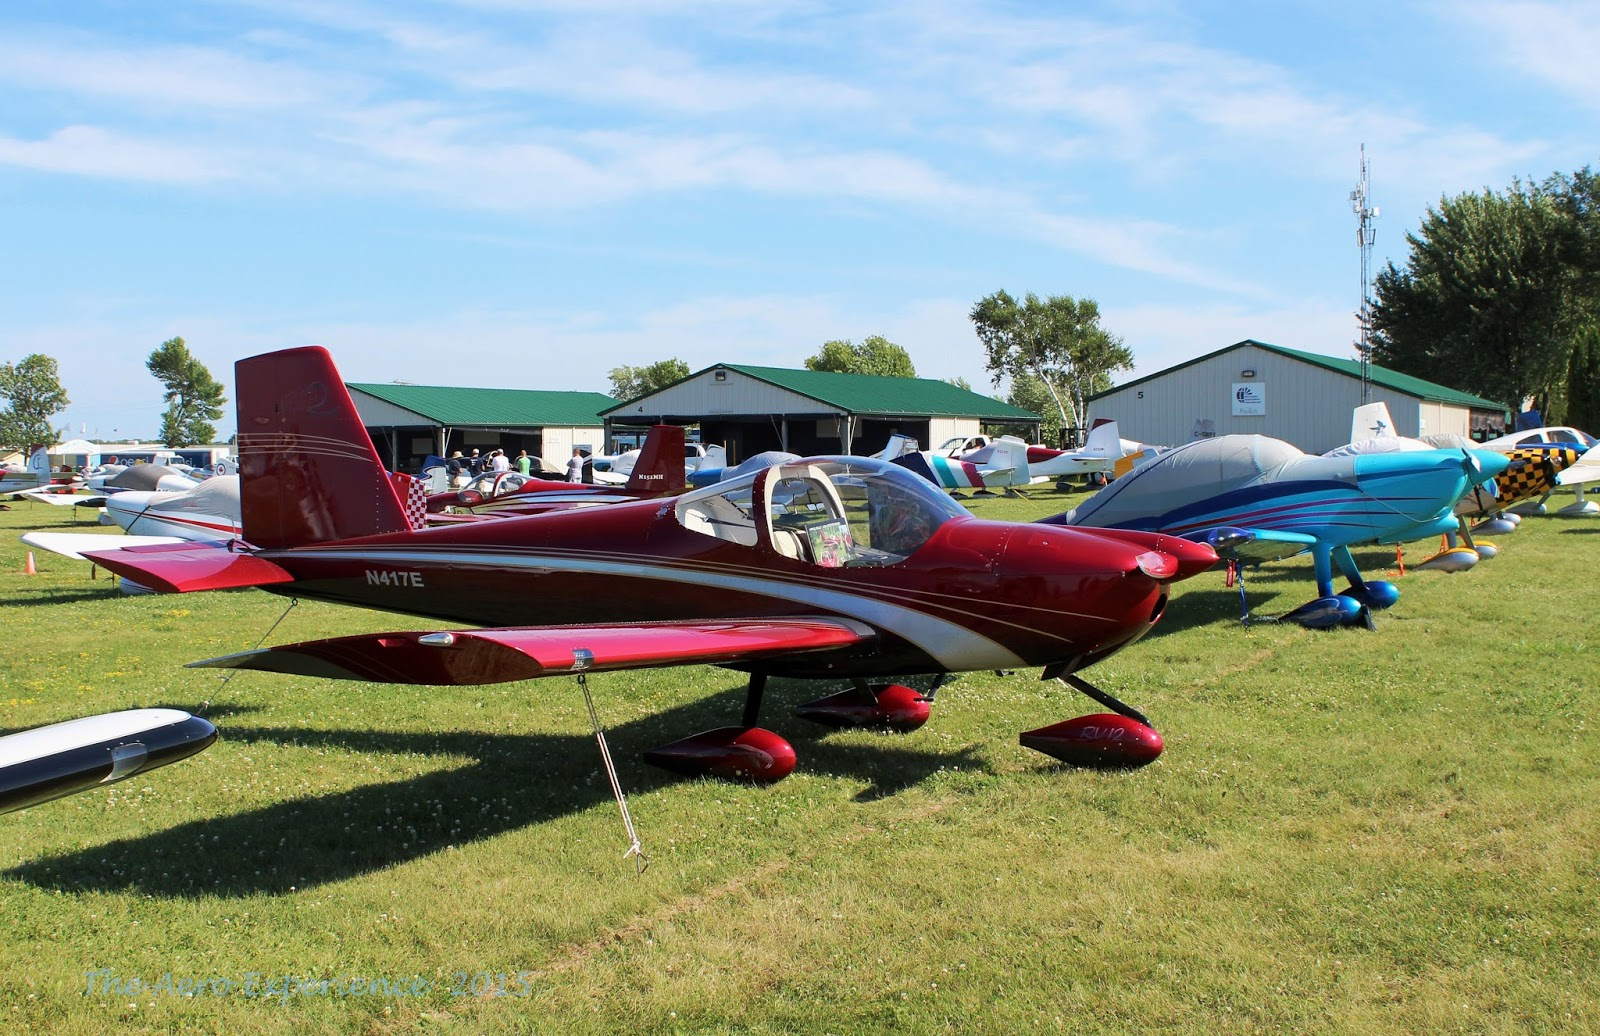 The Aero Experience: EAA AirVenture Oshkosh 2015: Exhibitors